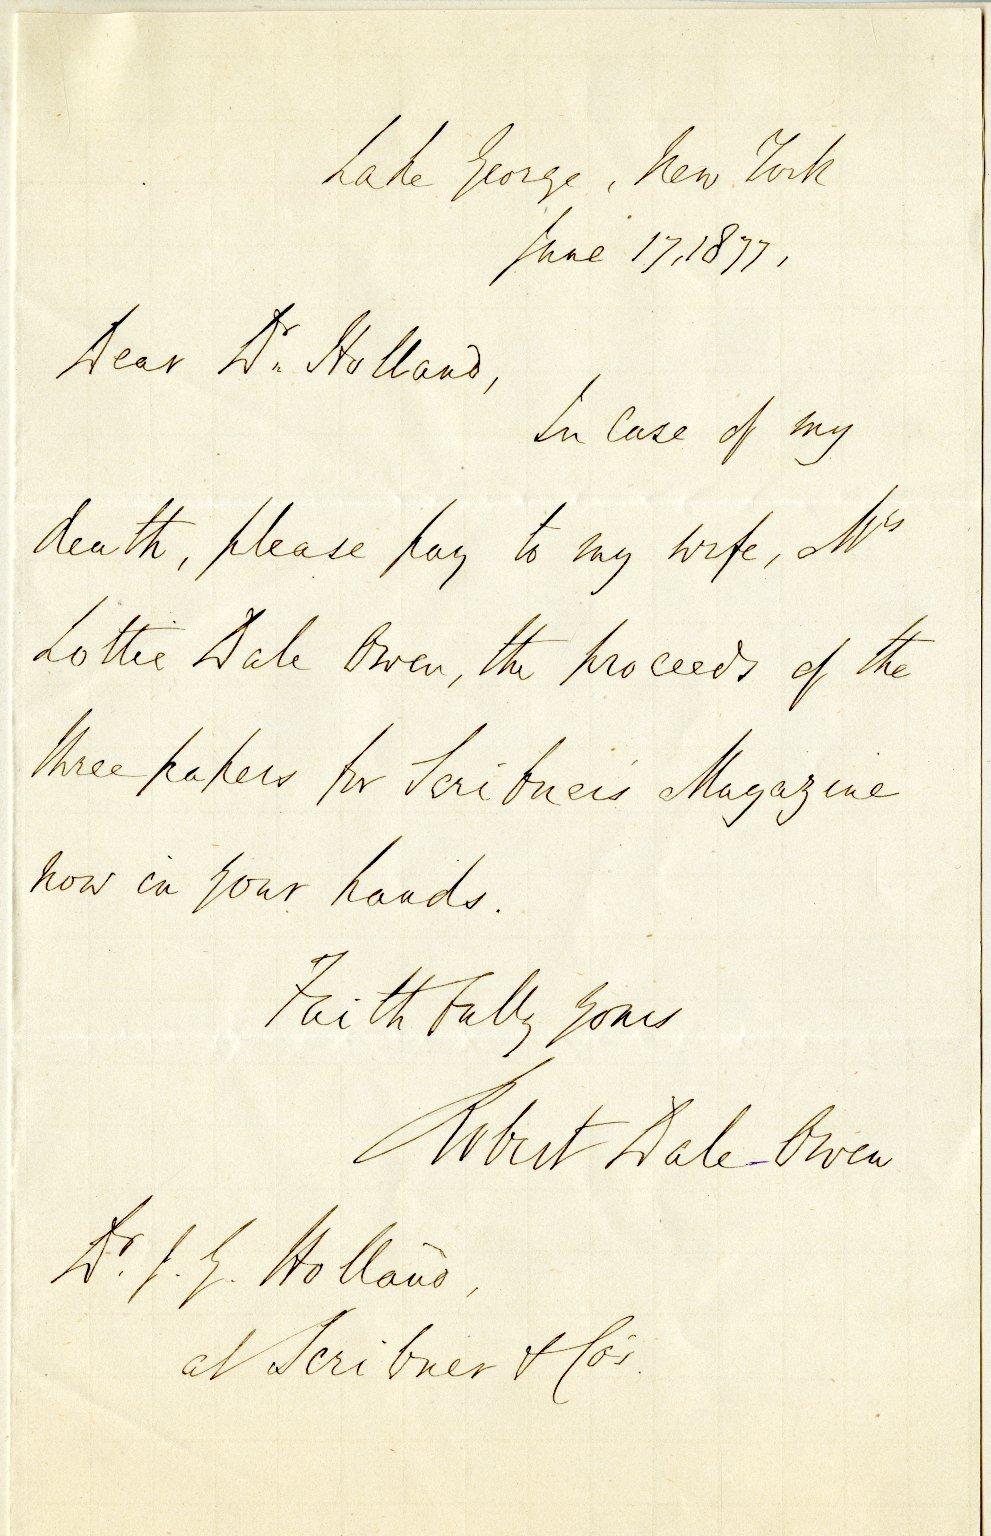 Owen, Robert Dale. ALS, 1 page, June 17, 1877.